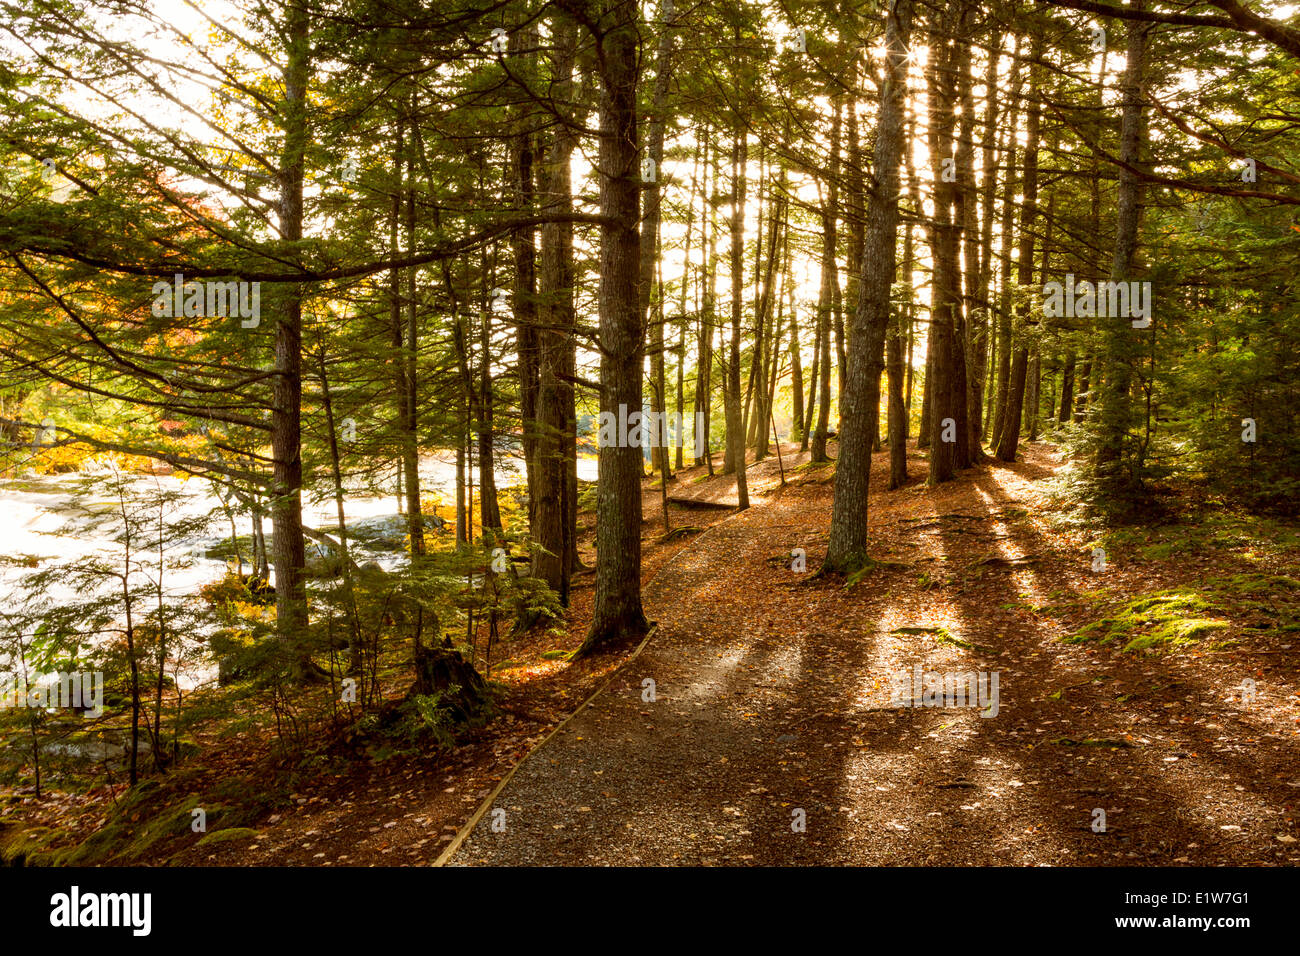 Mühlen-Fälle, Mersey River, Kejimkujik Nationalpark, Nova Scotia, Kanada Stockbild